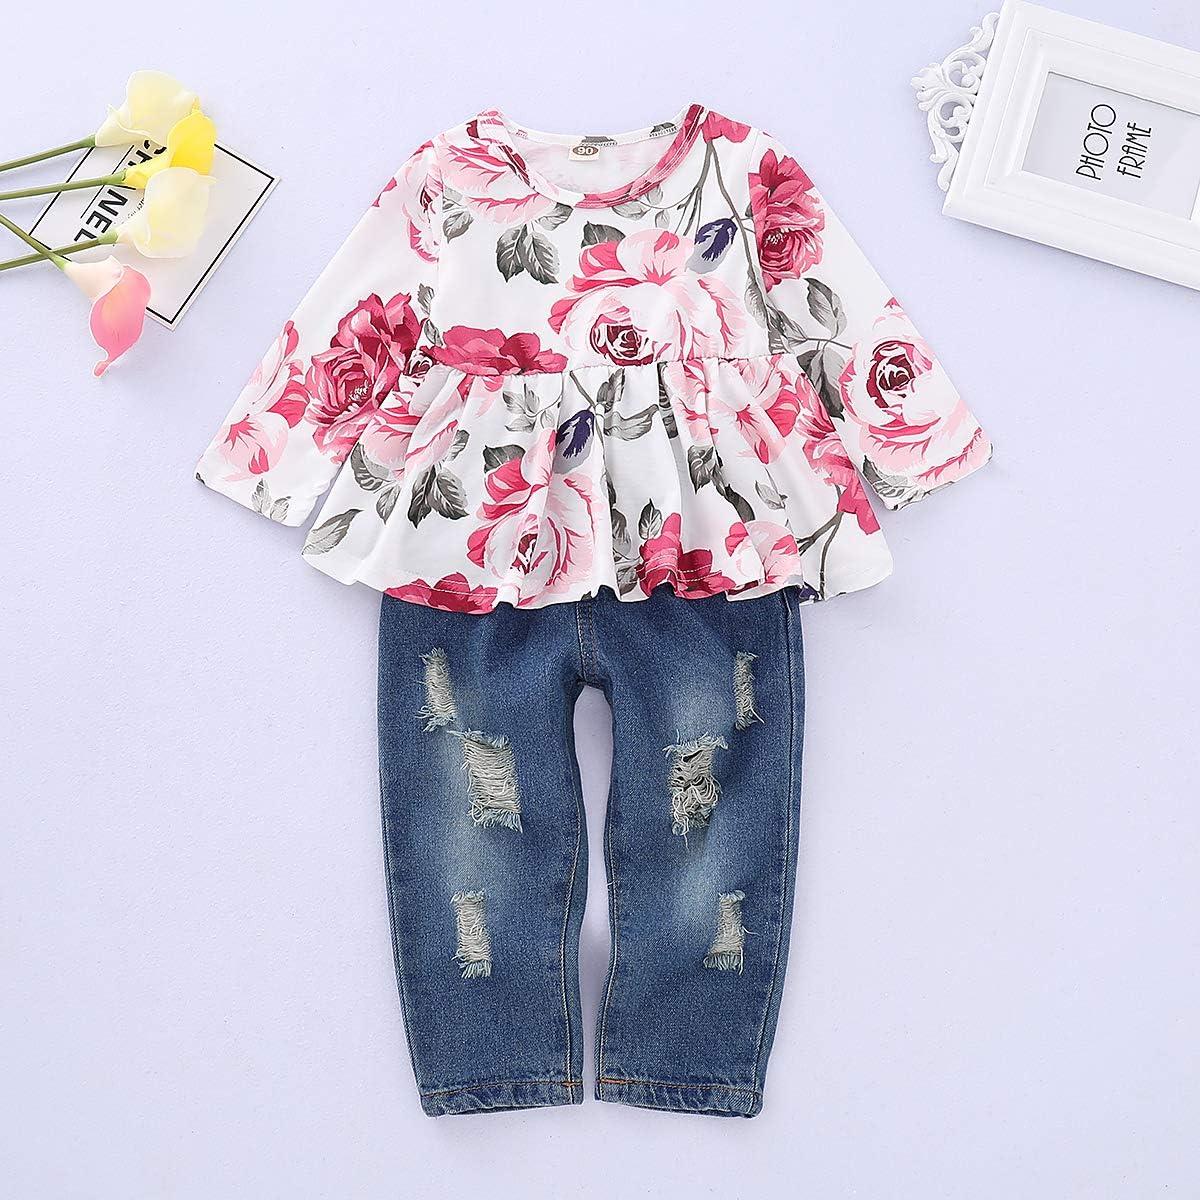 Amiley Newborn Baby Girls Boys flower Print Tops Shirt Pants 3PCS Outfits Set Clothes